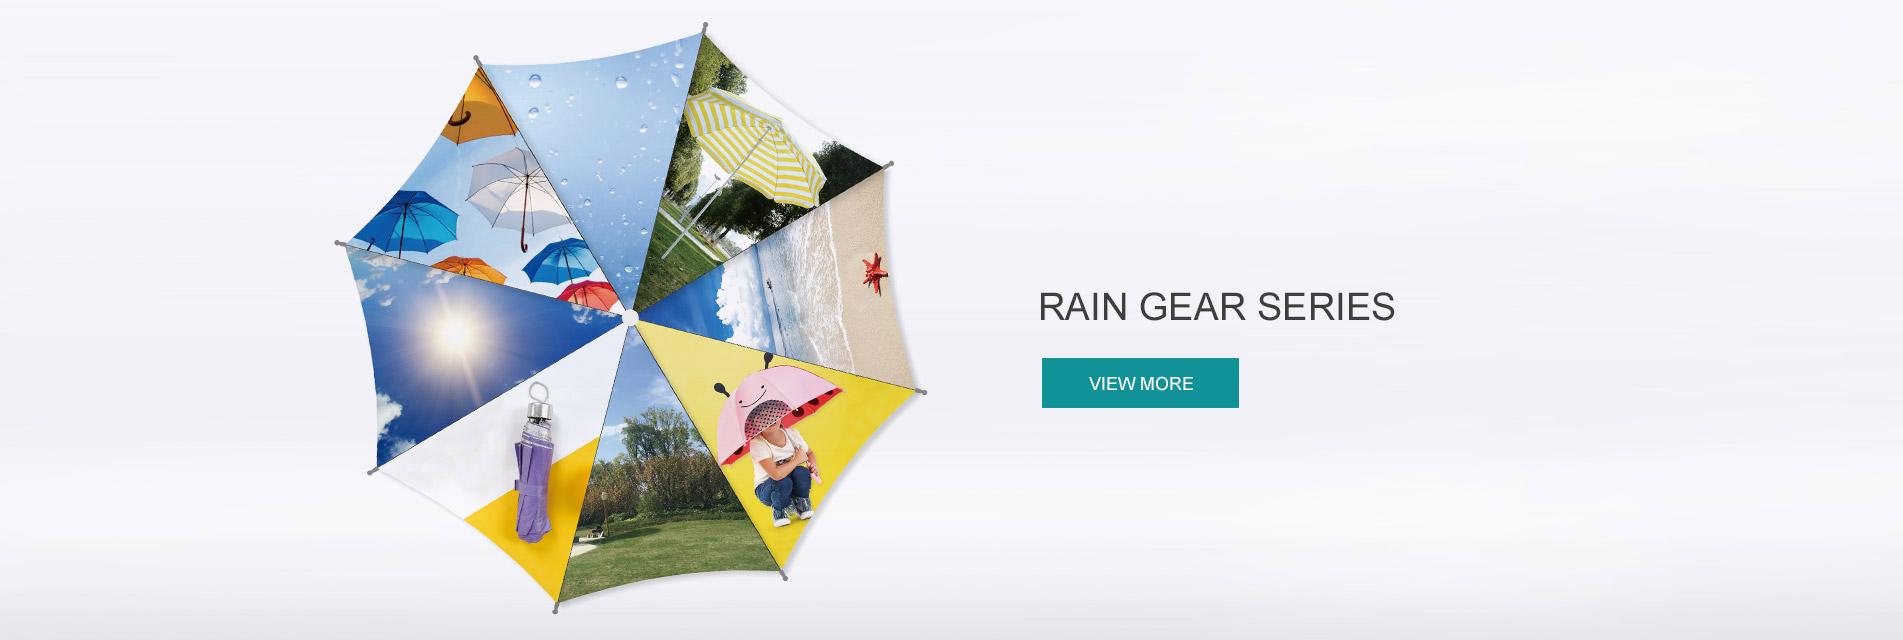 Rain Gear Series